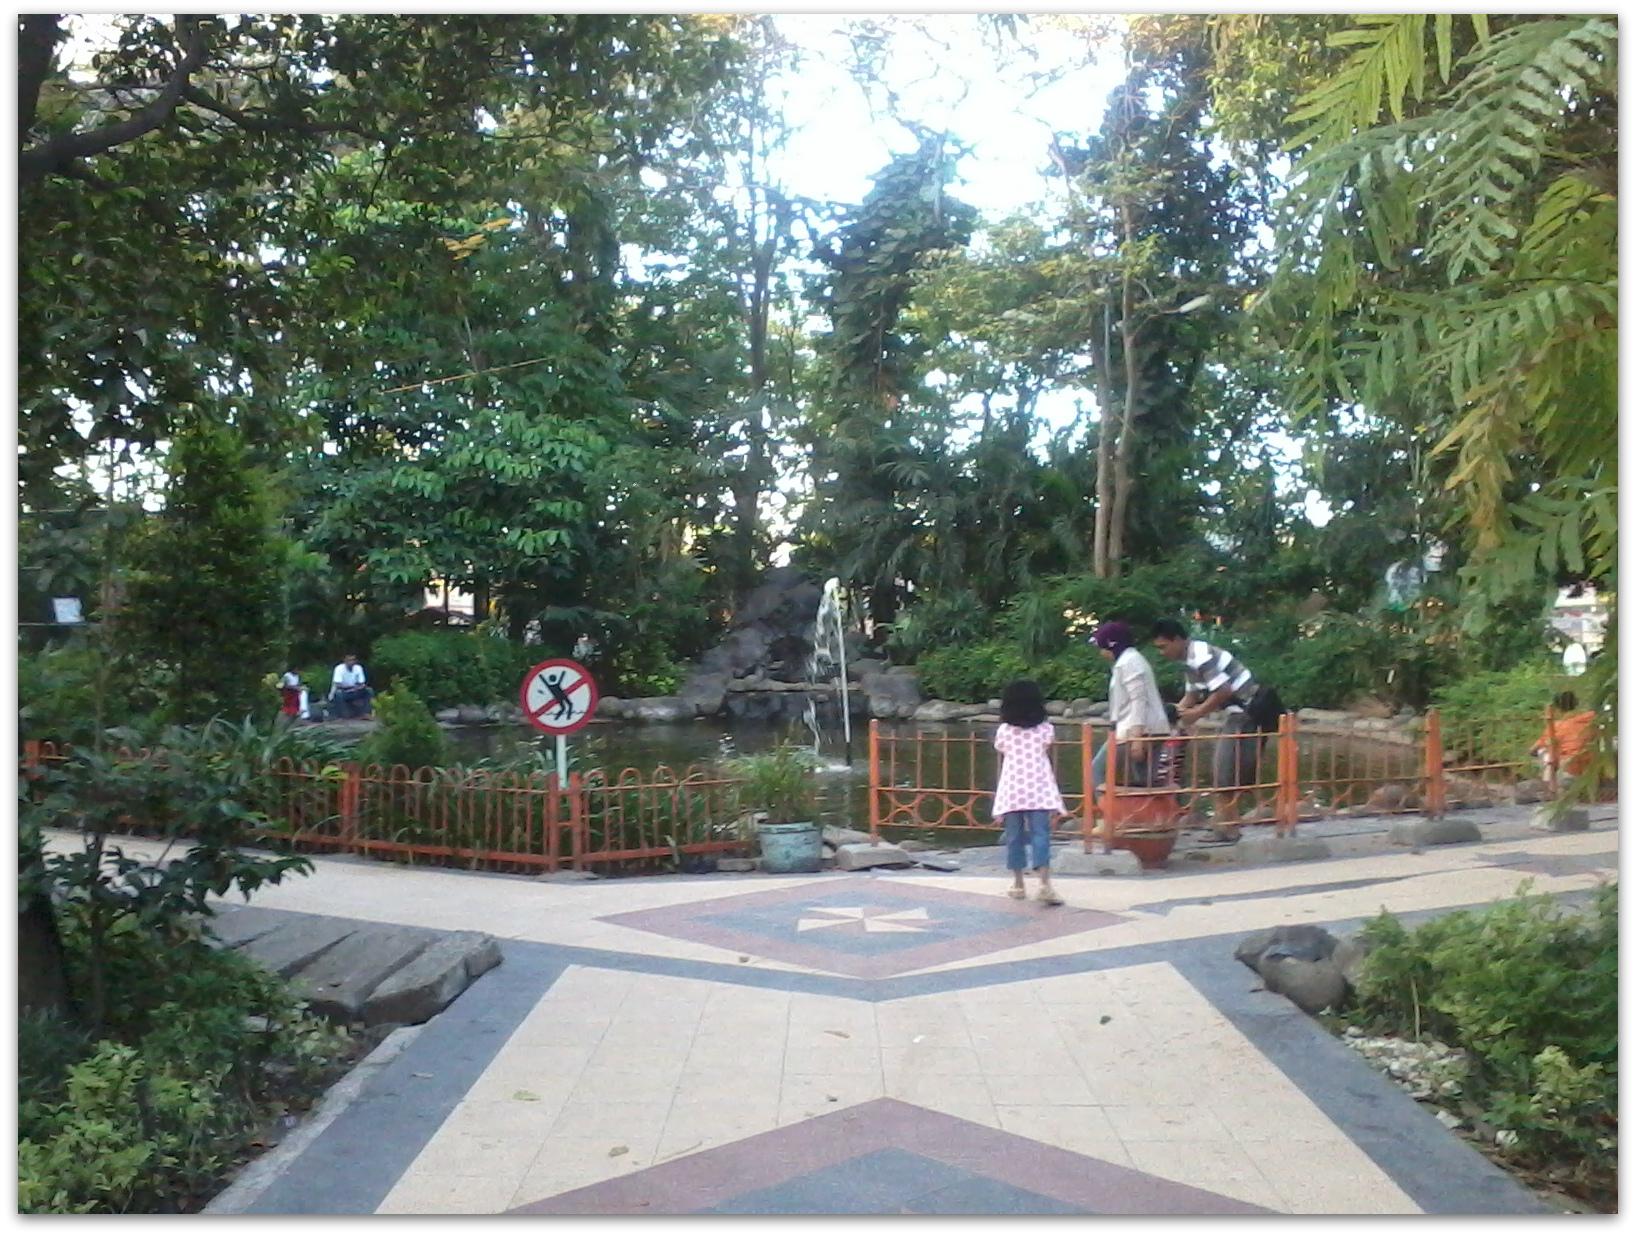 kebun bibit surabaya, taman flora, taman instagenic, foto-foto, dolaners, dolan dolen kebun bibit surabaya via ines komala siti hanifa - Dolan Dolen